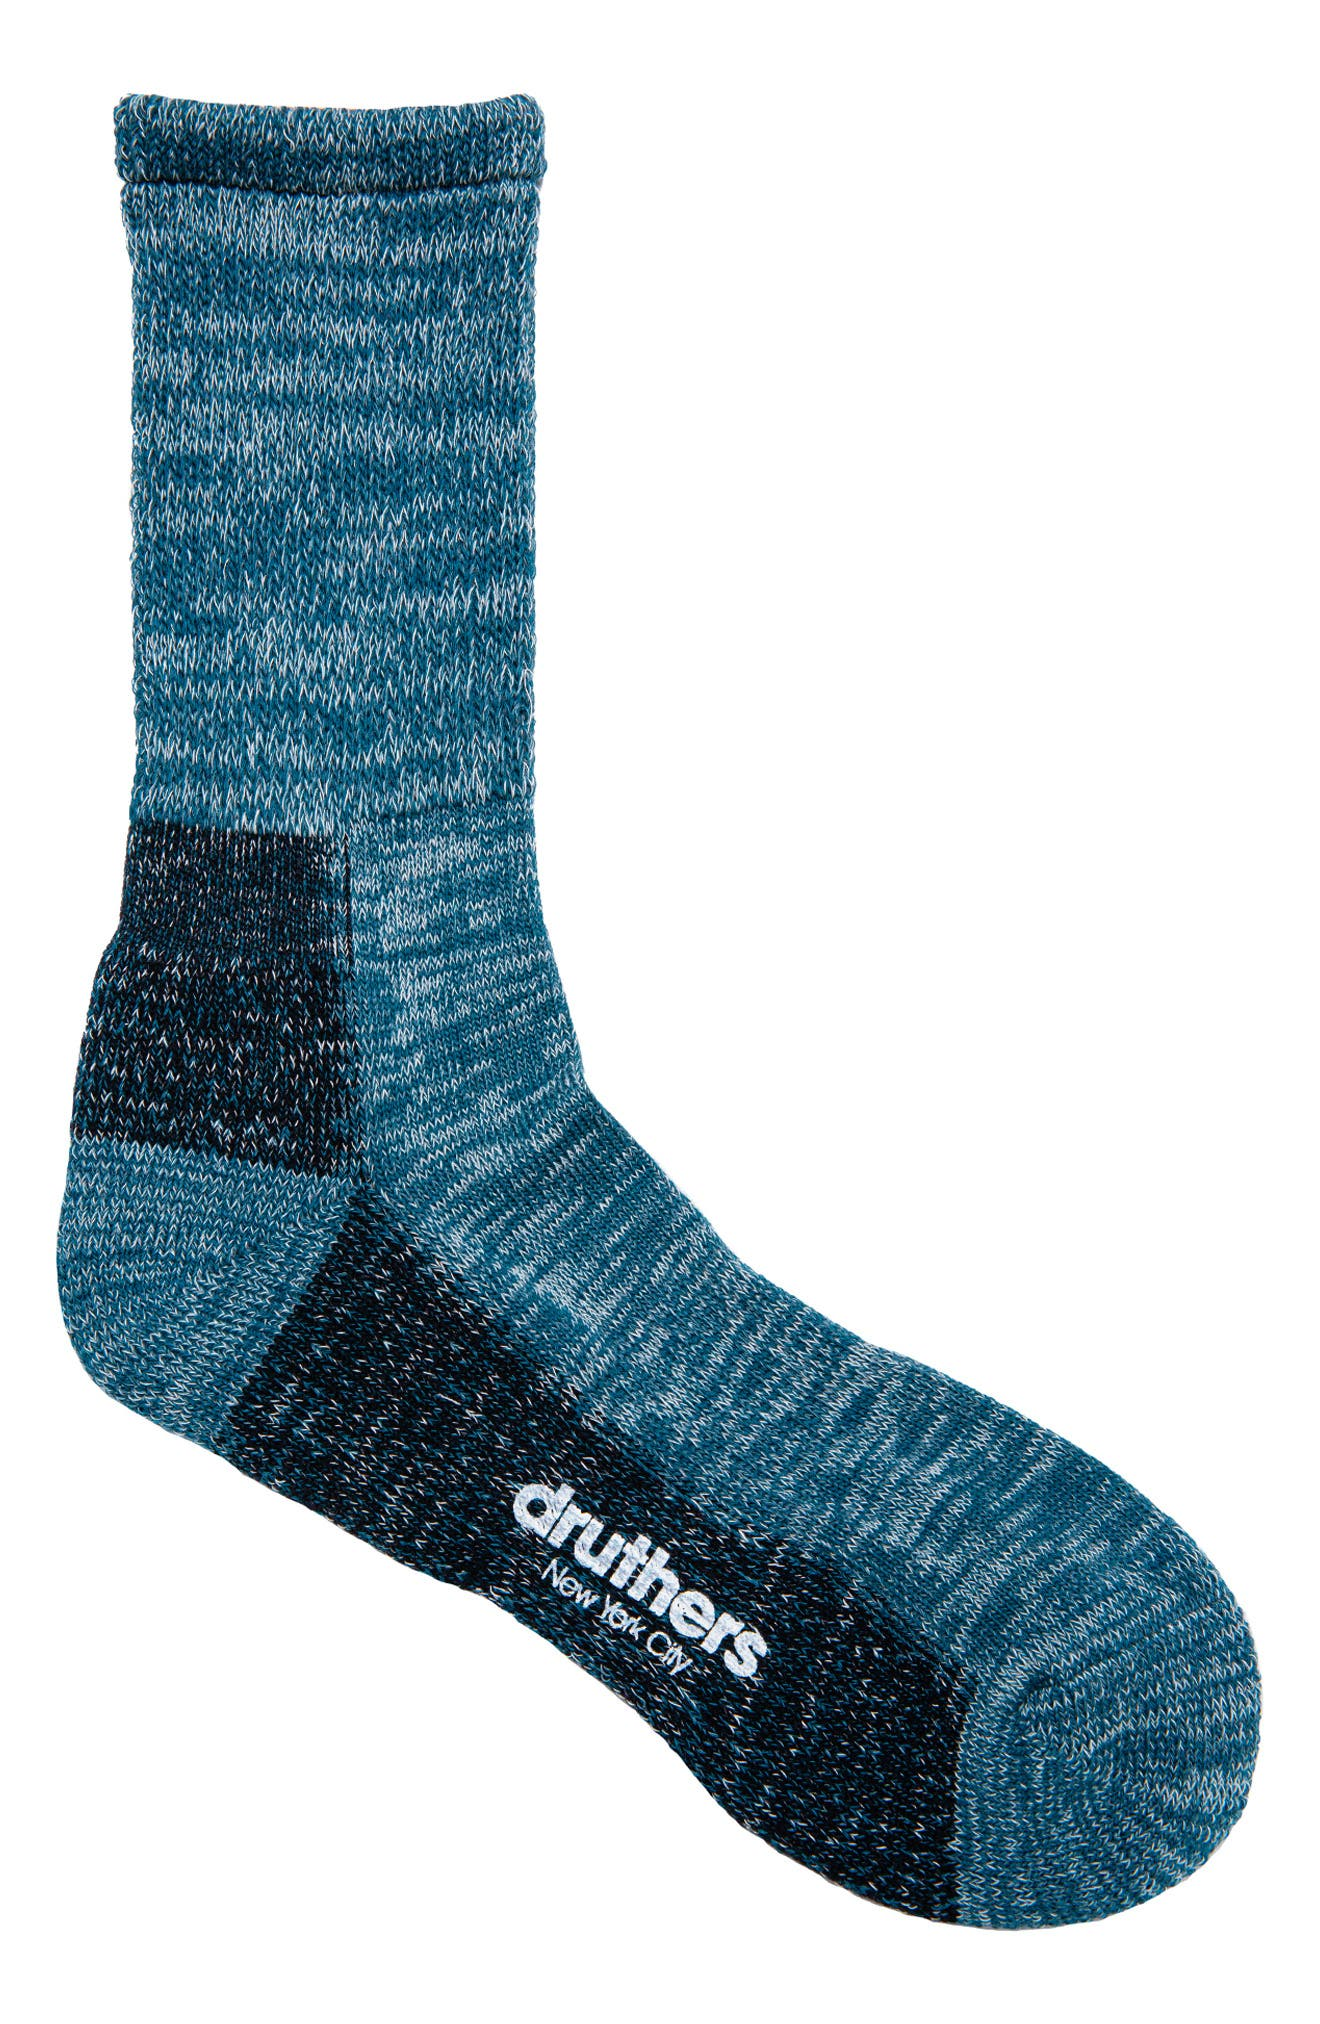 Everyday Organic Cotton Blend Crew Socks